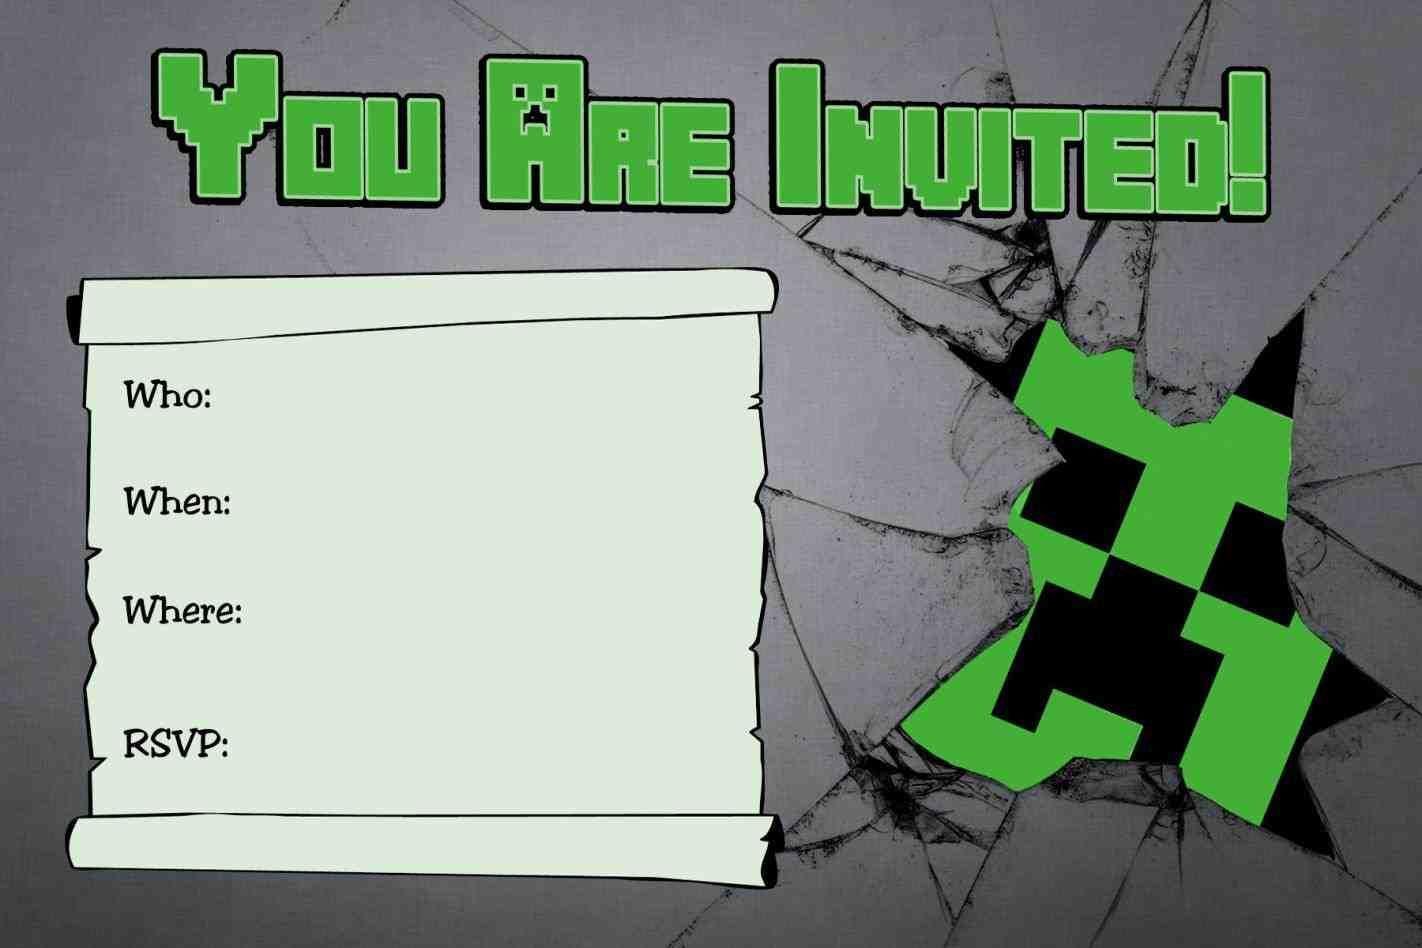 Homemade Birthday Card Ideas Yuntae Birthday Card Belated Birthday Wishes Ecard Minecraft Party Invitations Minecraft Birthday Minecraft Birthday Invitations